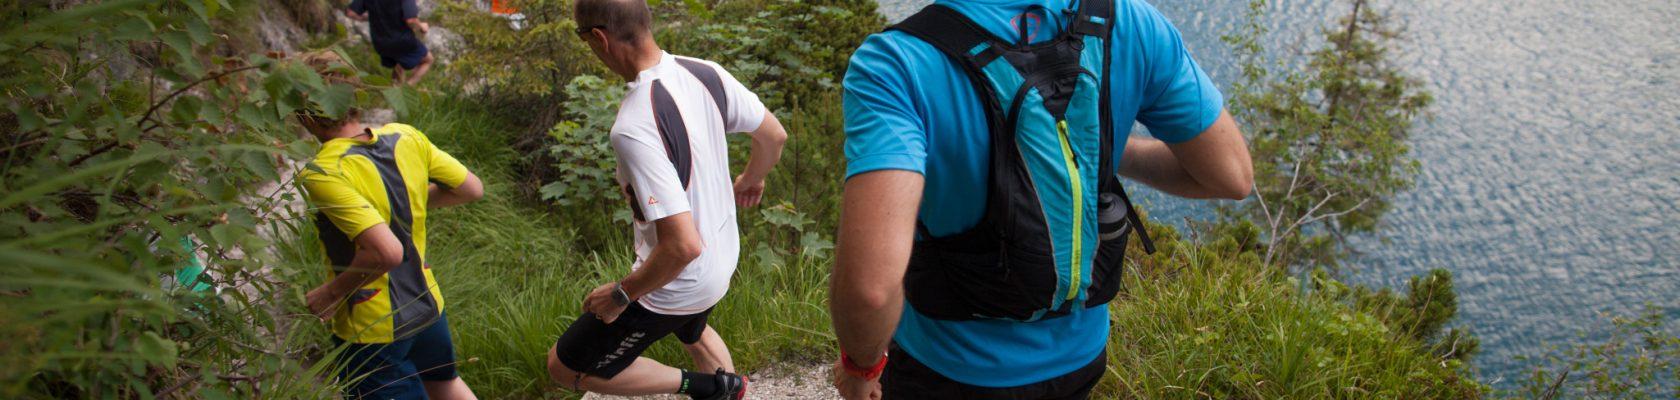 Streckenbesichtung (Bildnachweis: sportalpen.com)